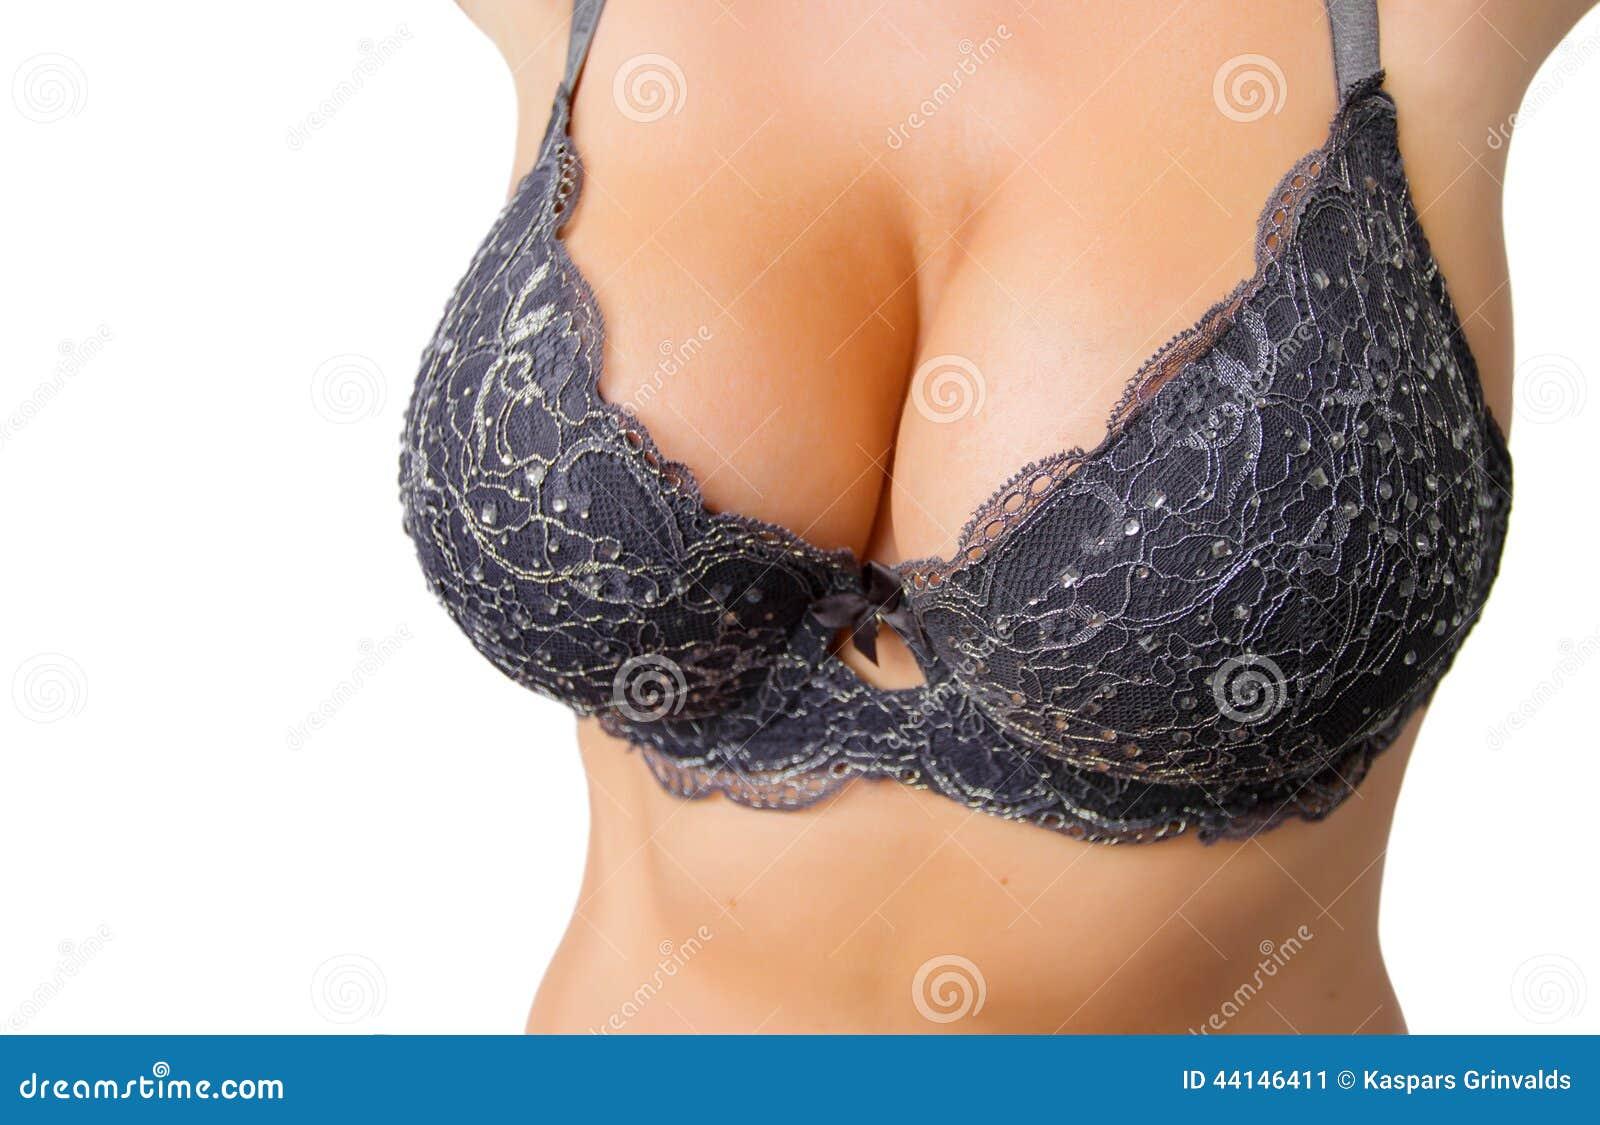 Photos of women with big boobs